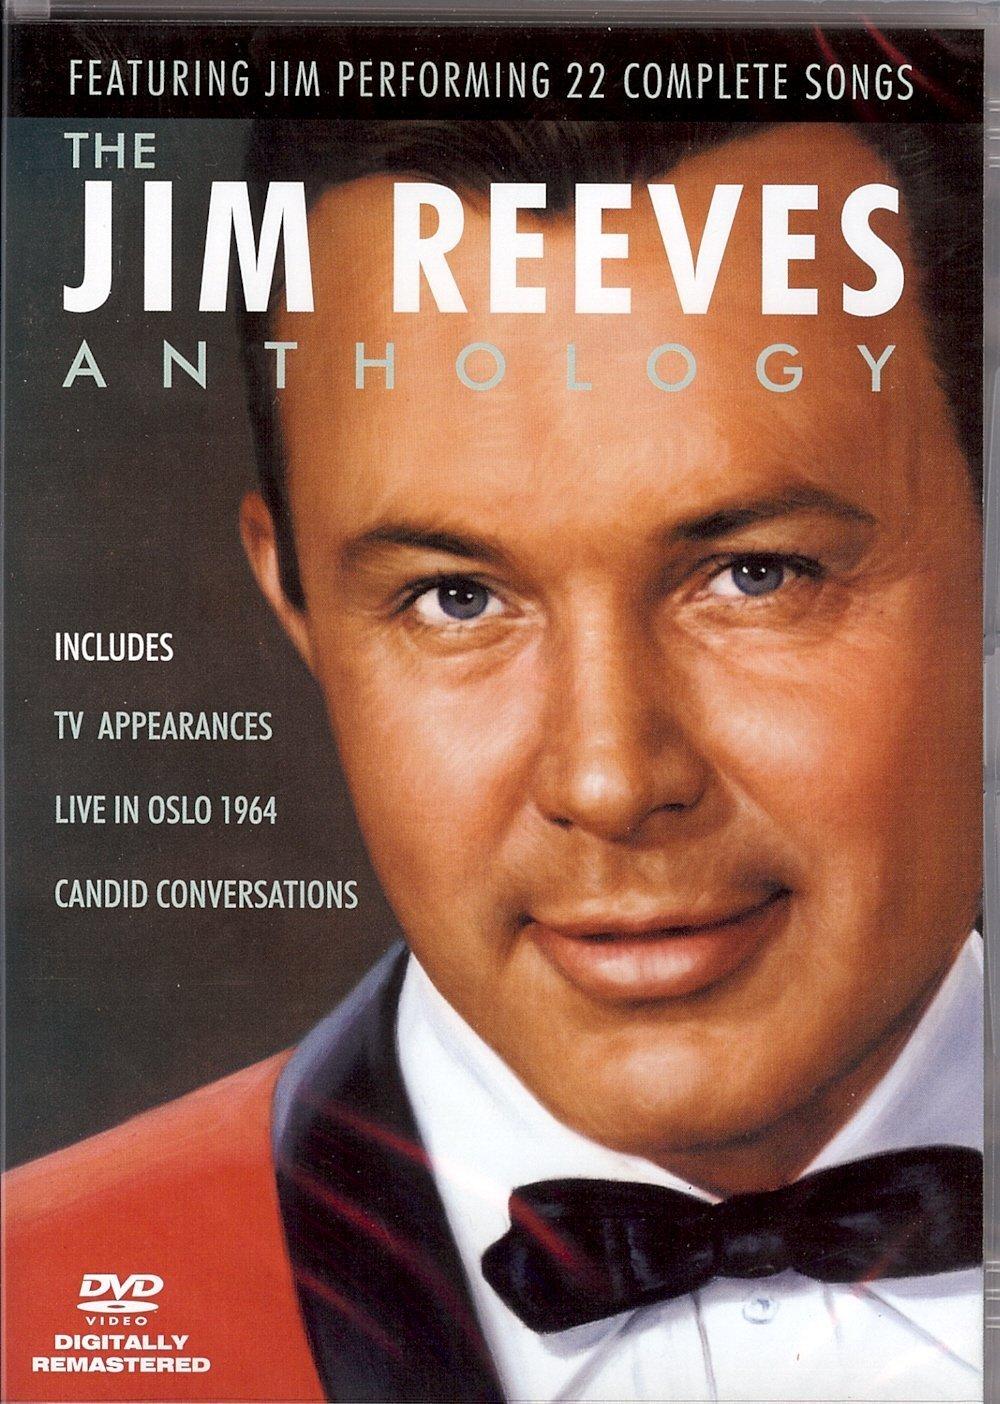 The Jim Reeves Anthology [DVD]: Amazon.co.uk: Jim Reeves: DVD ...